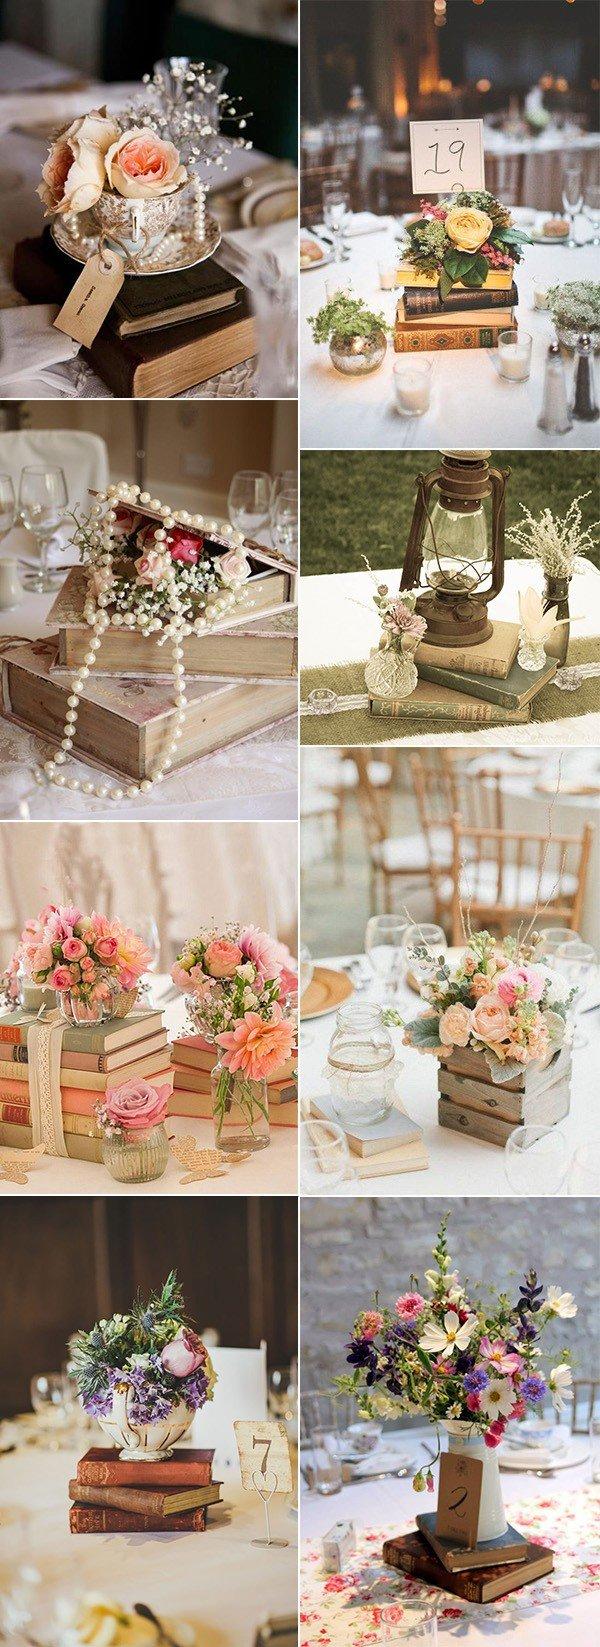 Books Wedding Decor Wedding Centerpiece Ideas Archives Oh Best Day Ever